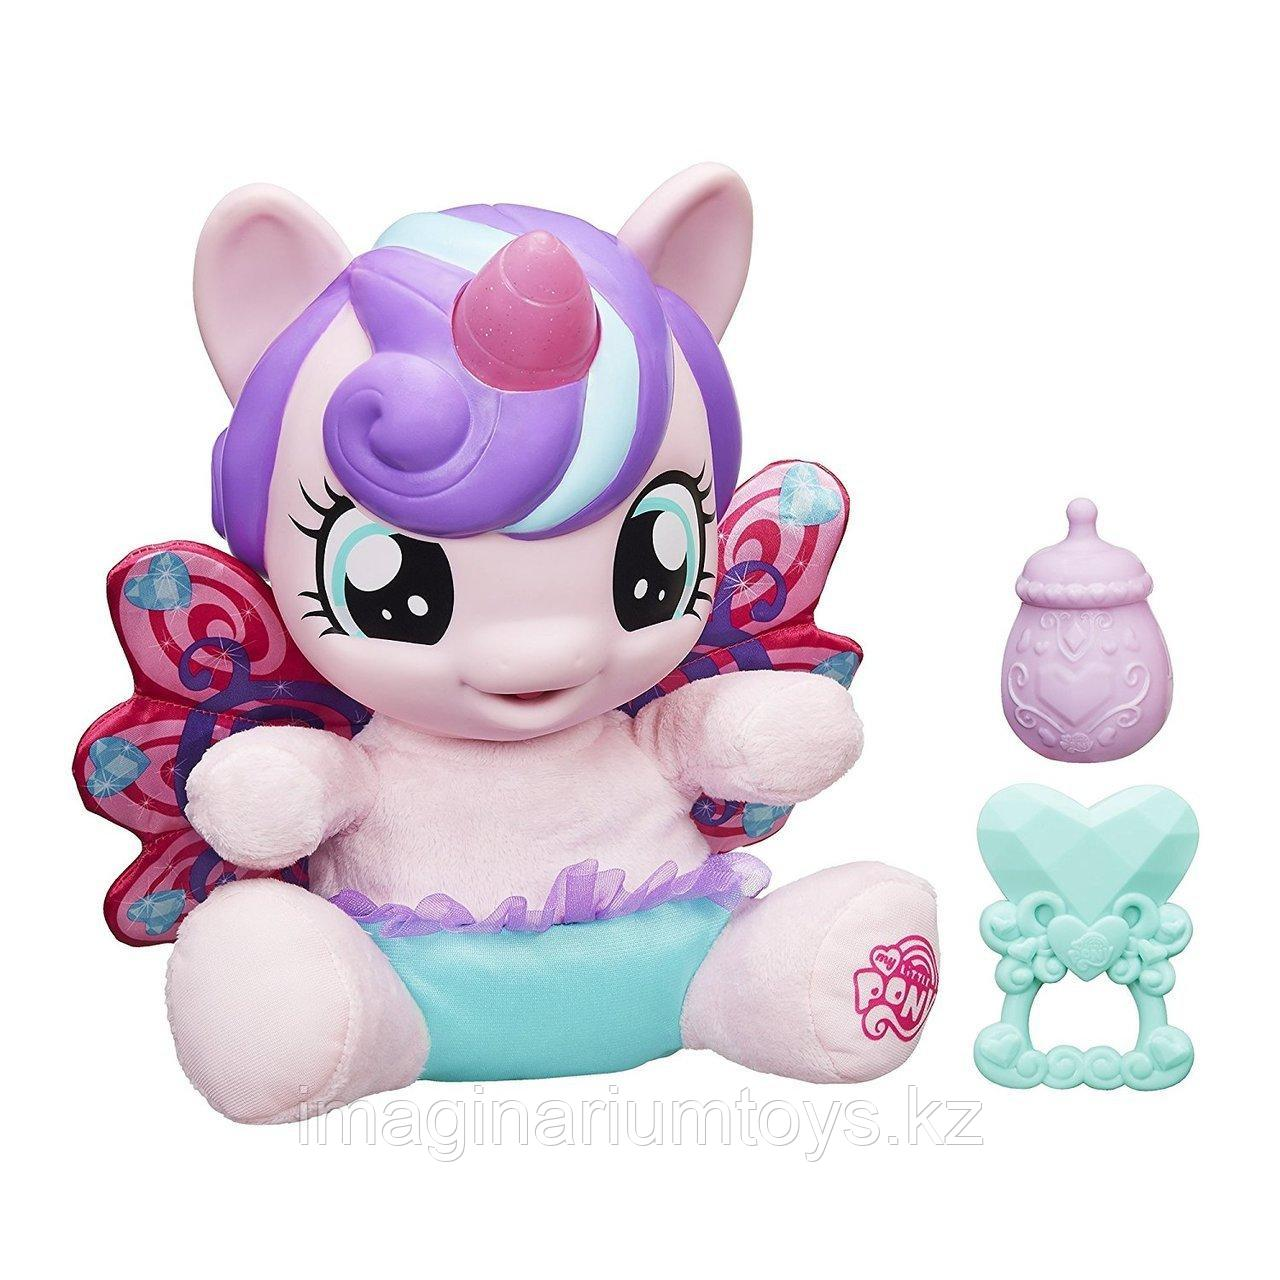 Игрушка интерактивная Фларри Харт My Little Pony